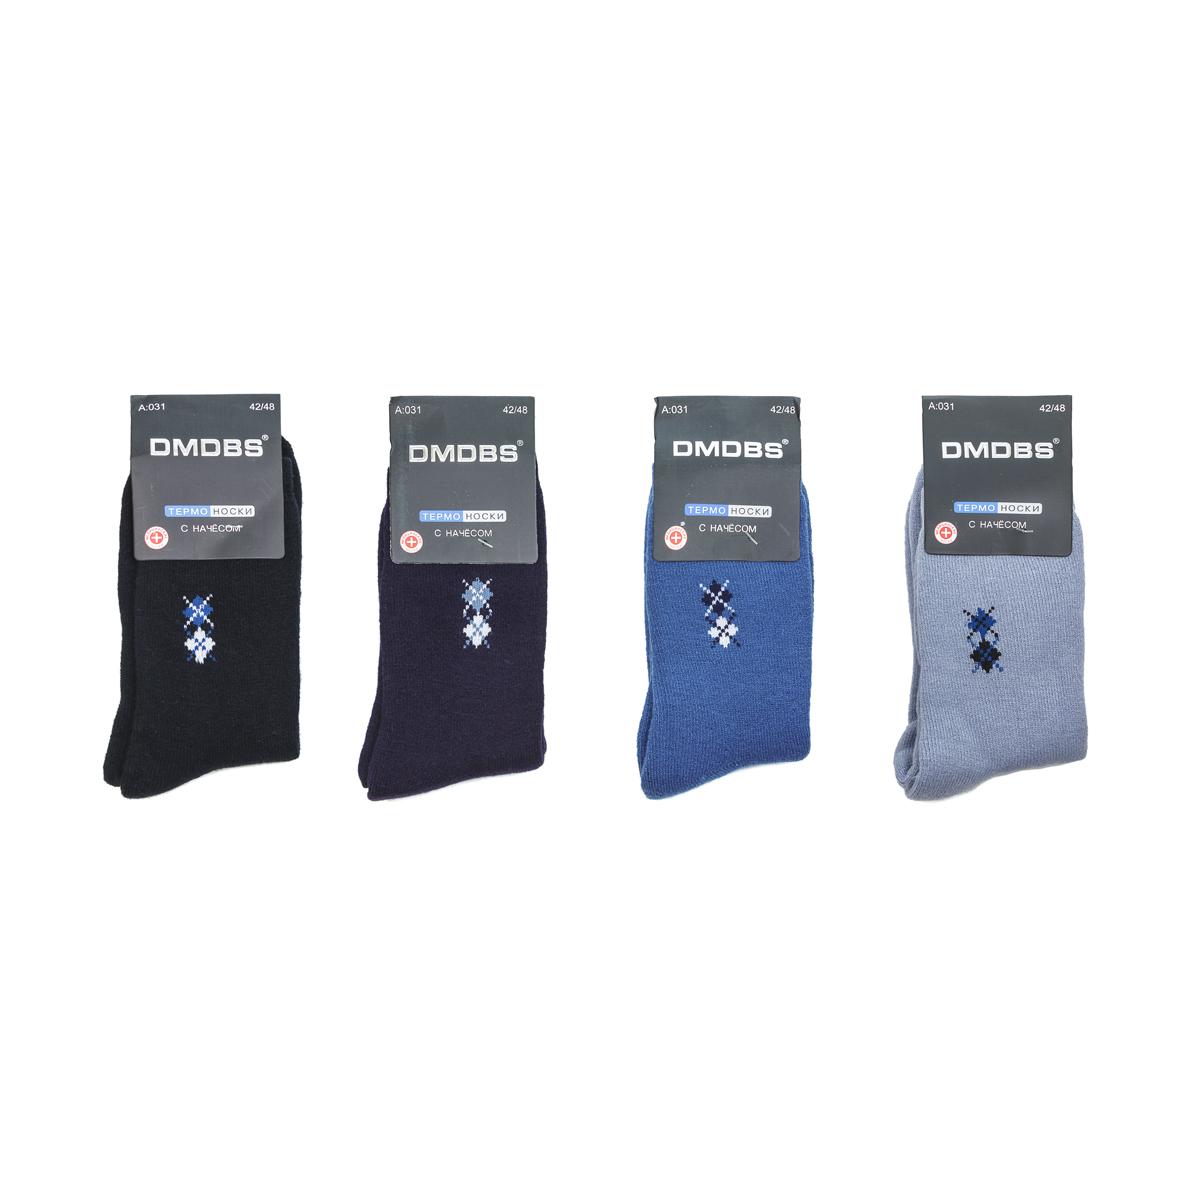 Муж. носки арт. 12-0014 Голубой р. 42-48Распродажа товаров<br><br><br>Тип: Муж. носки<br>Размер: 42-48<br>Материал: Трикотаж